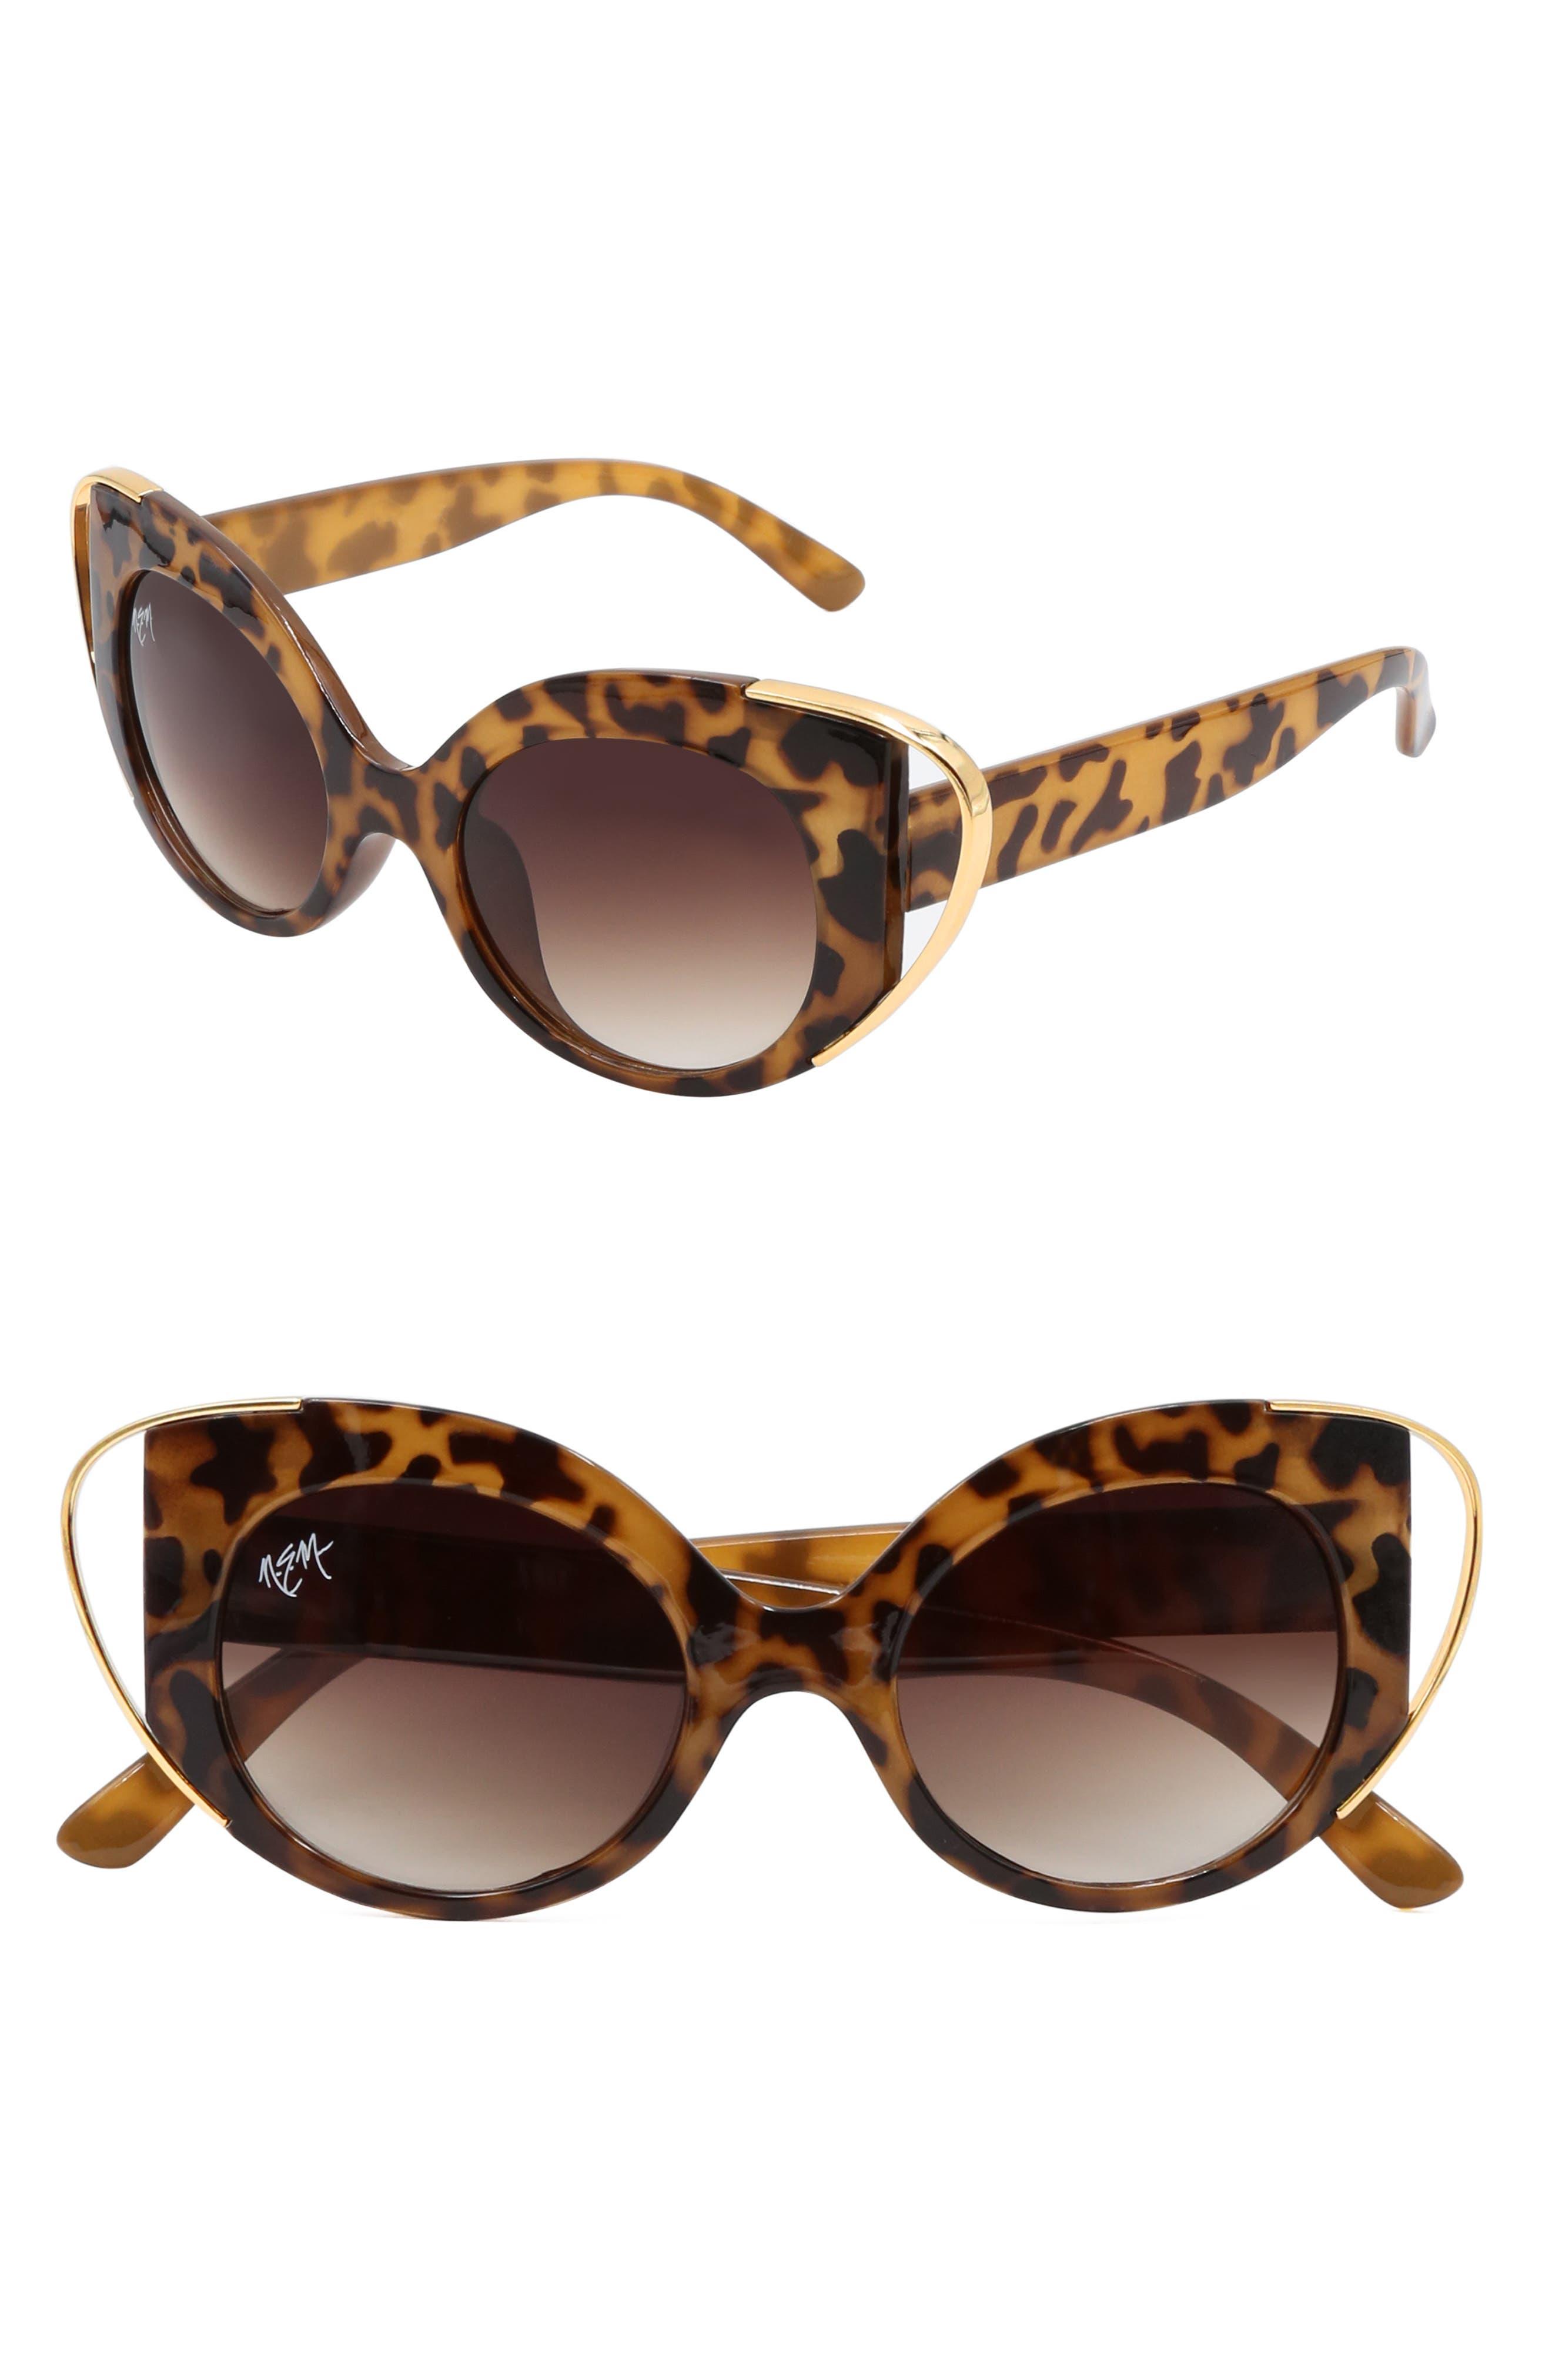 Nem Audrey 50Mm Cutout Cat Eye Sunglasses - Tortoise W Amber Lens